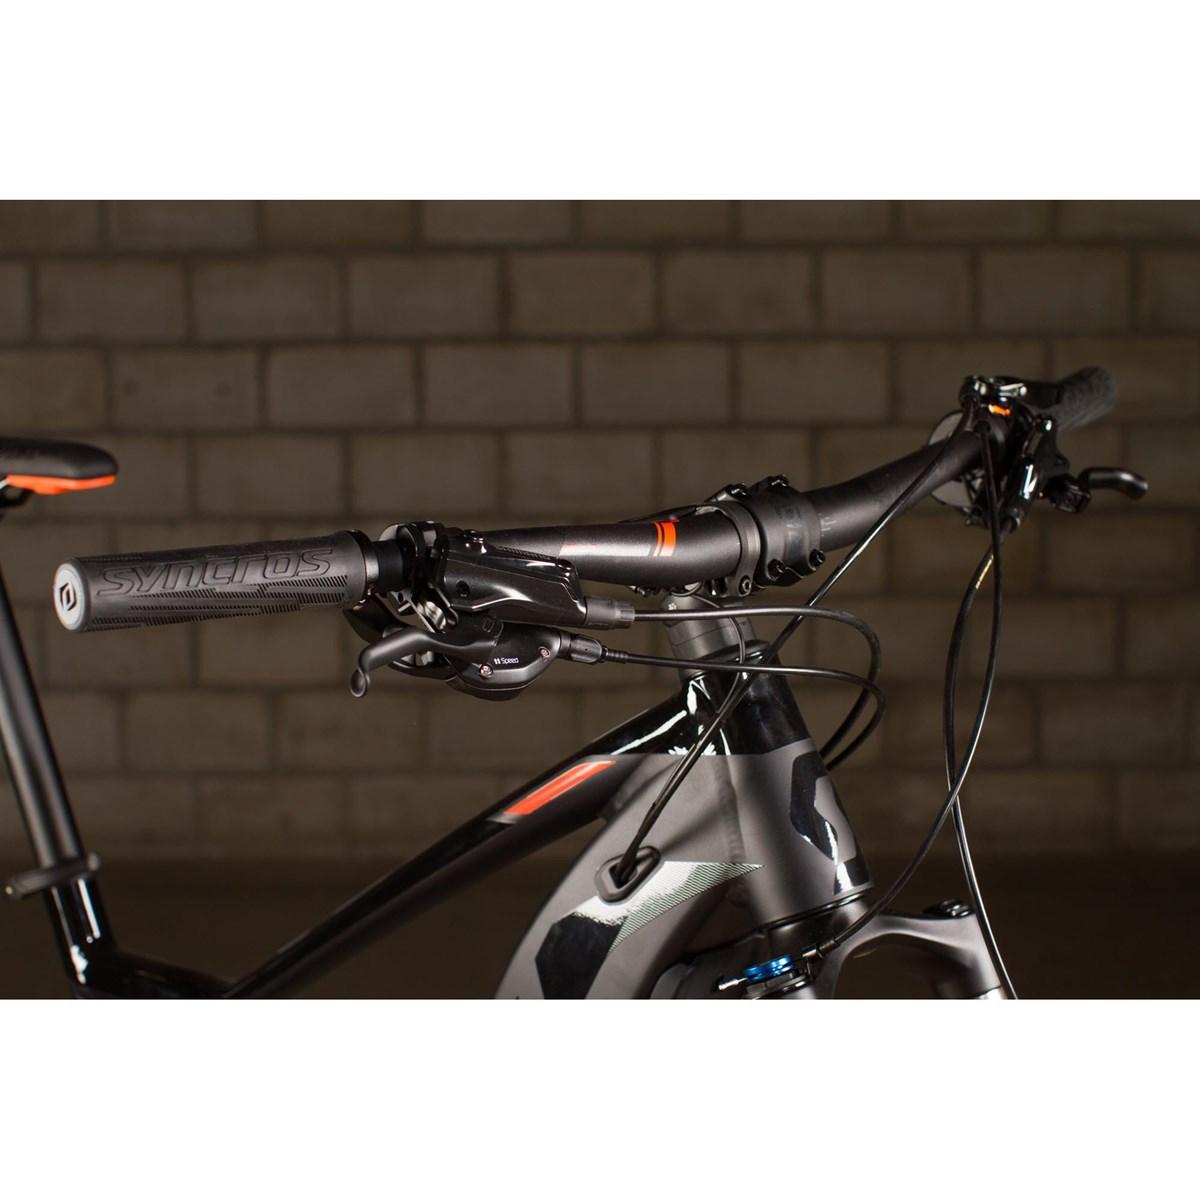 Fair Trading Licence Check >> 2018 Scott E-Spark 730 Full Suspension Electric Mountain Bike £3,999.00